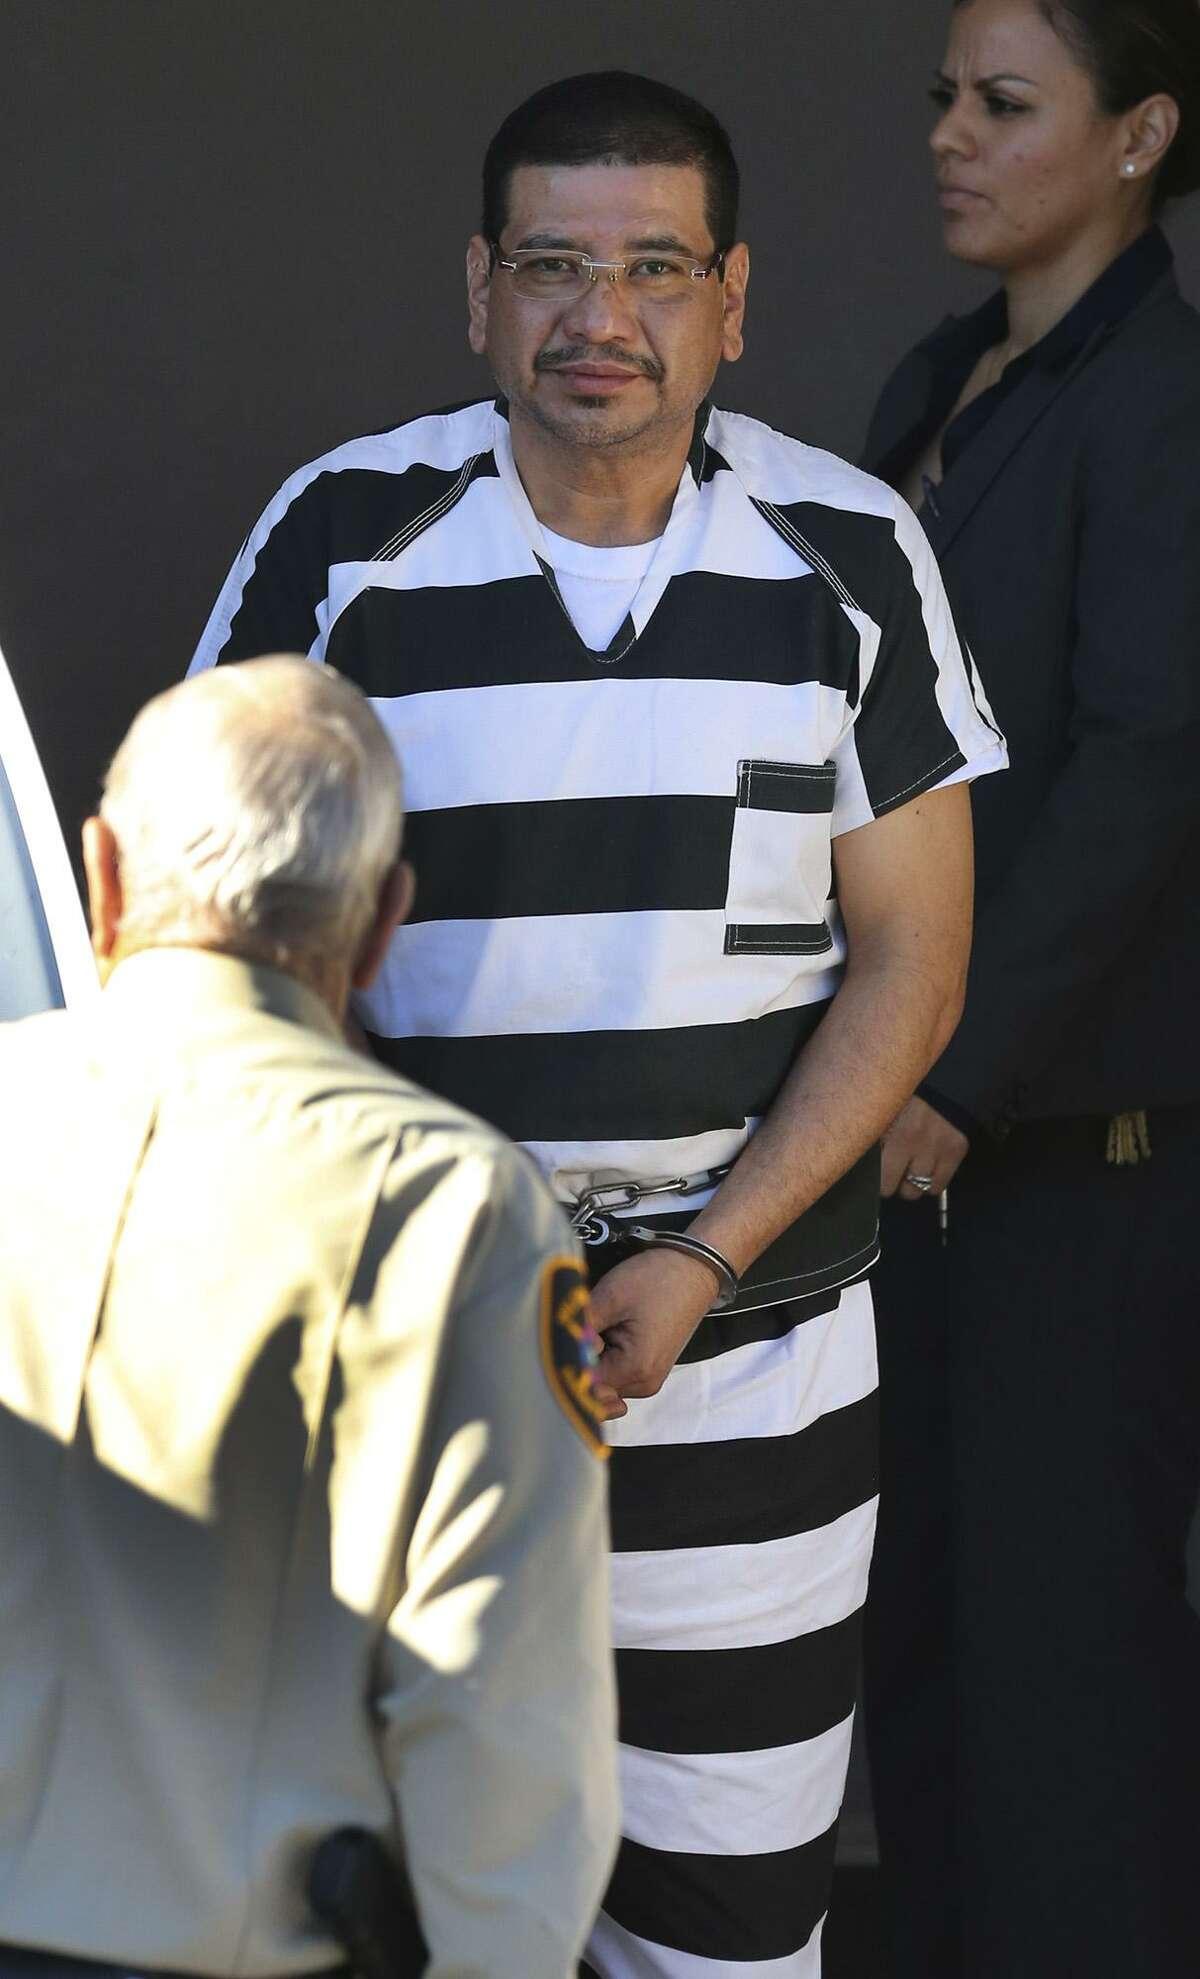 Reymundo Villarreal Arelis (center) is escorted to a van Jan. 23, 2017 at the John Wood Jr. Federal Courthouse.